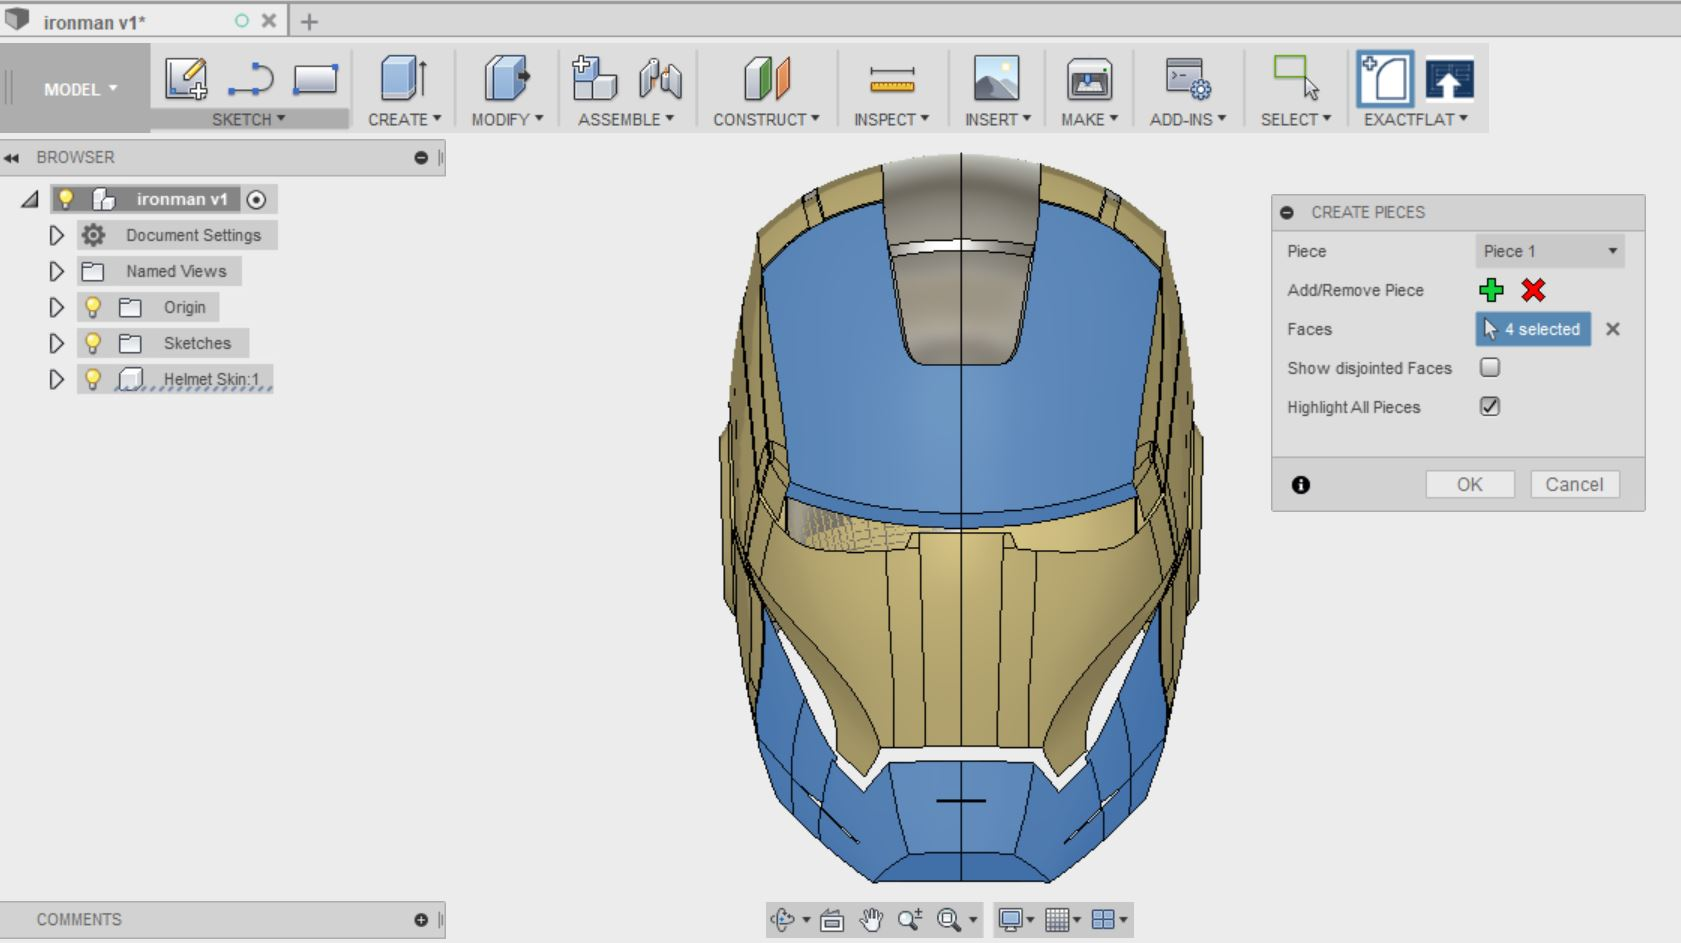 ironman model 2.JPG